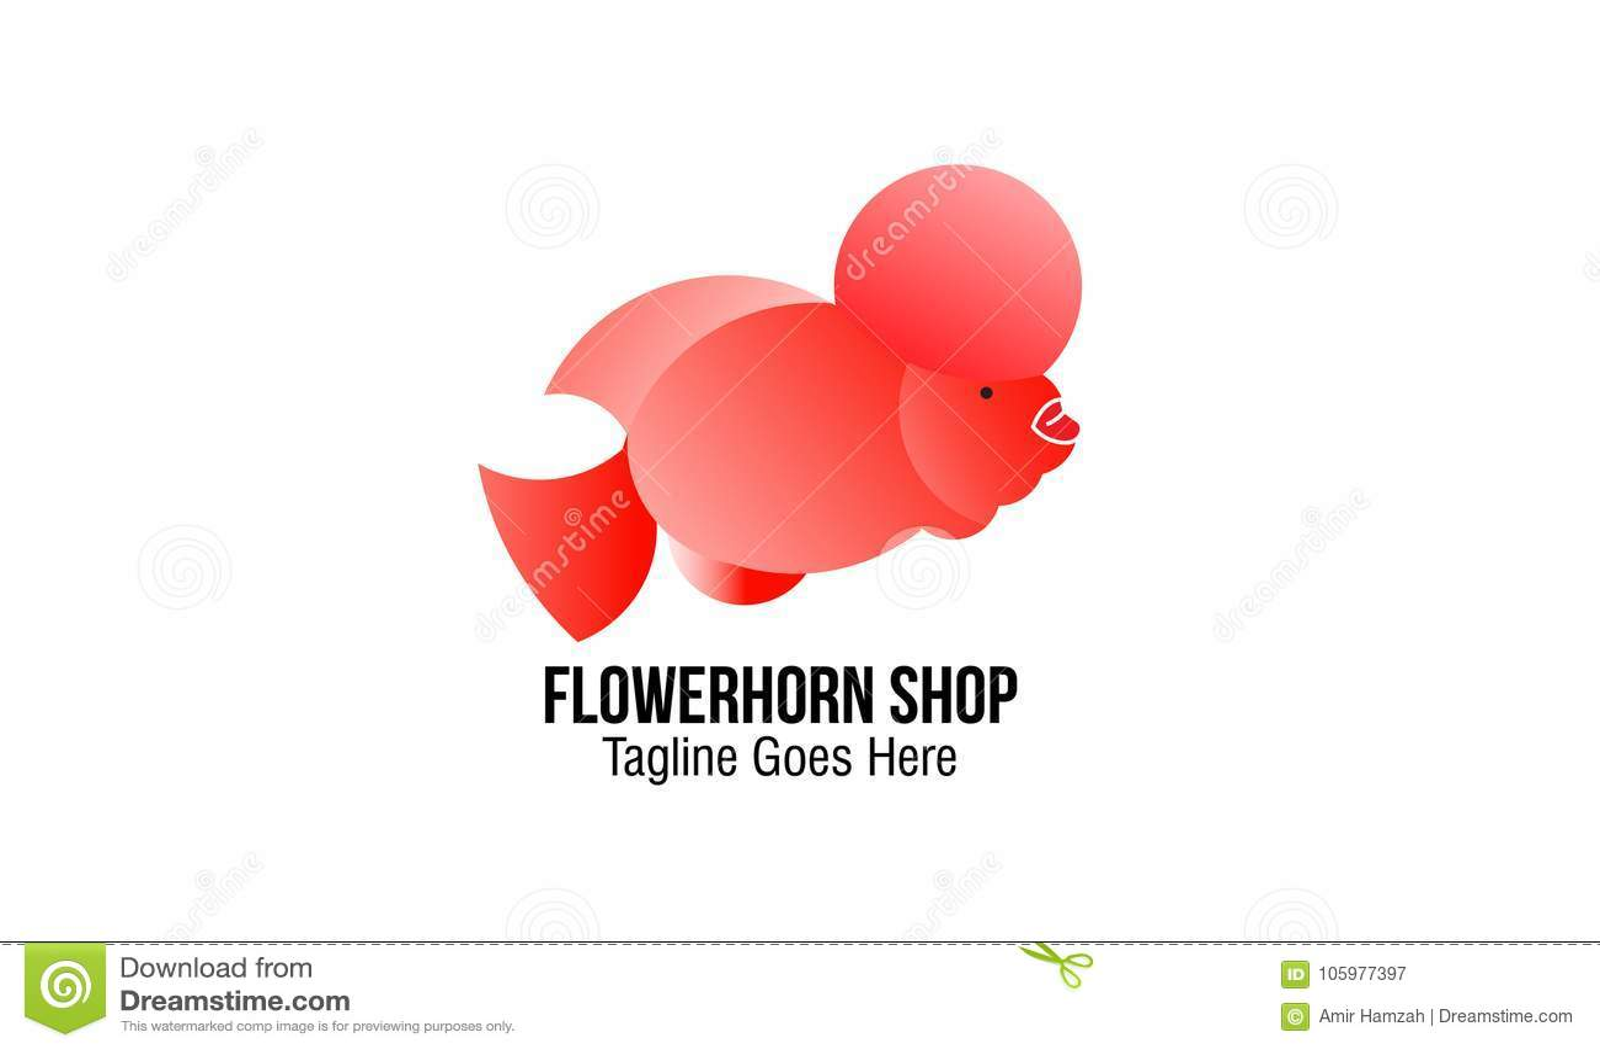 Flowerhorn Shop stock vector  Illustration of dolphin - 105977397